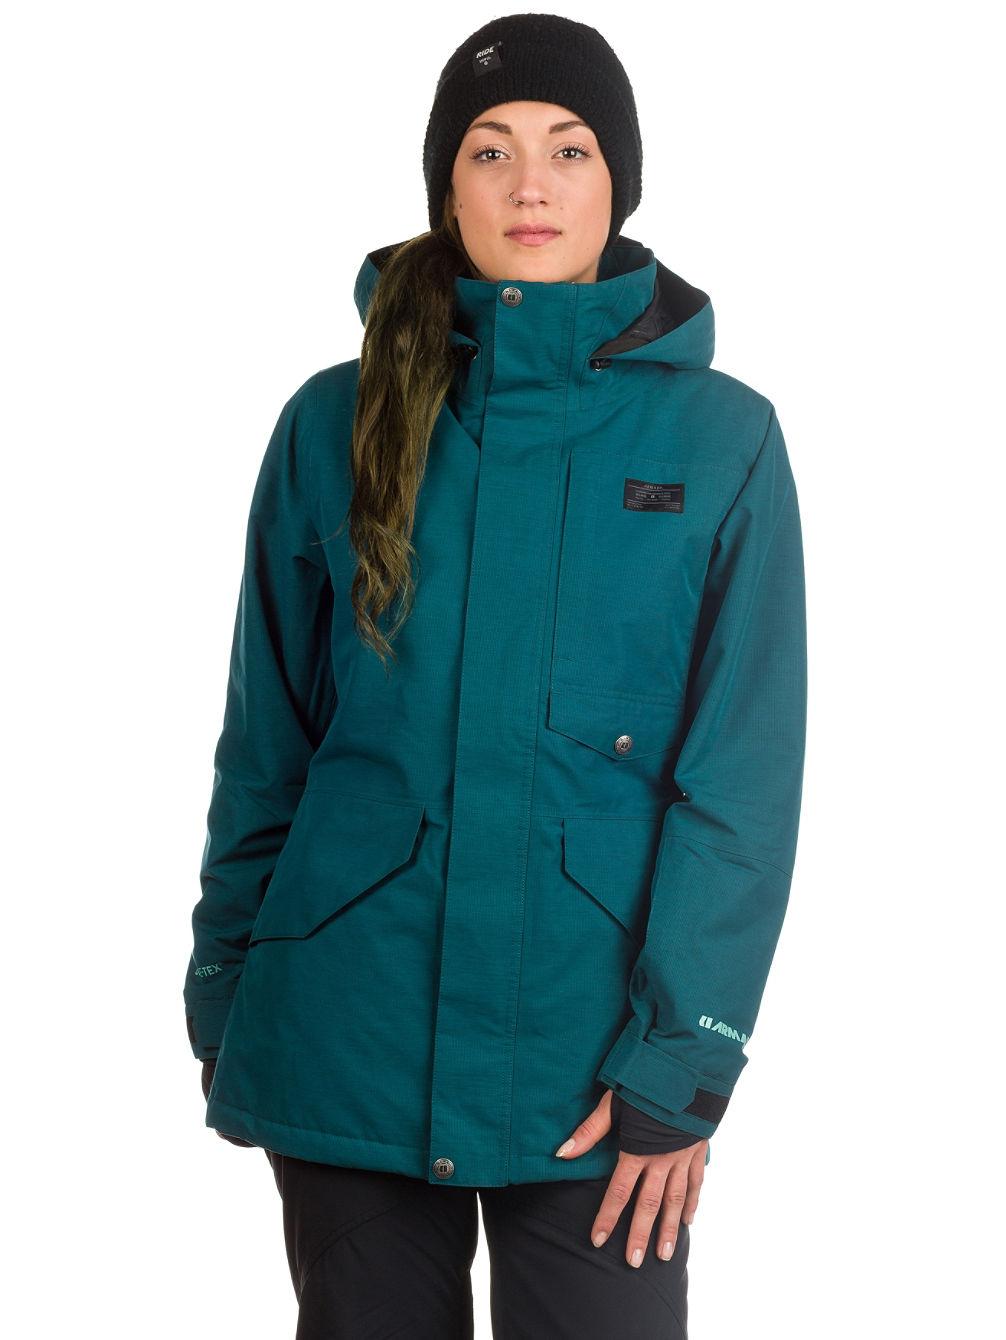 achetez armada kana gore tex insulated veste en ligne sur blue. Black Bedroom Furniture Sets. Home Design Ideas